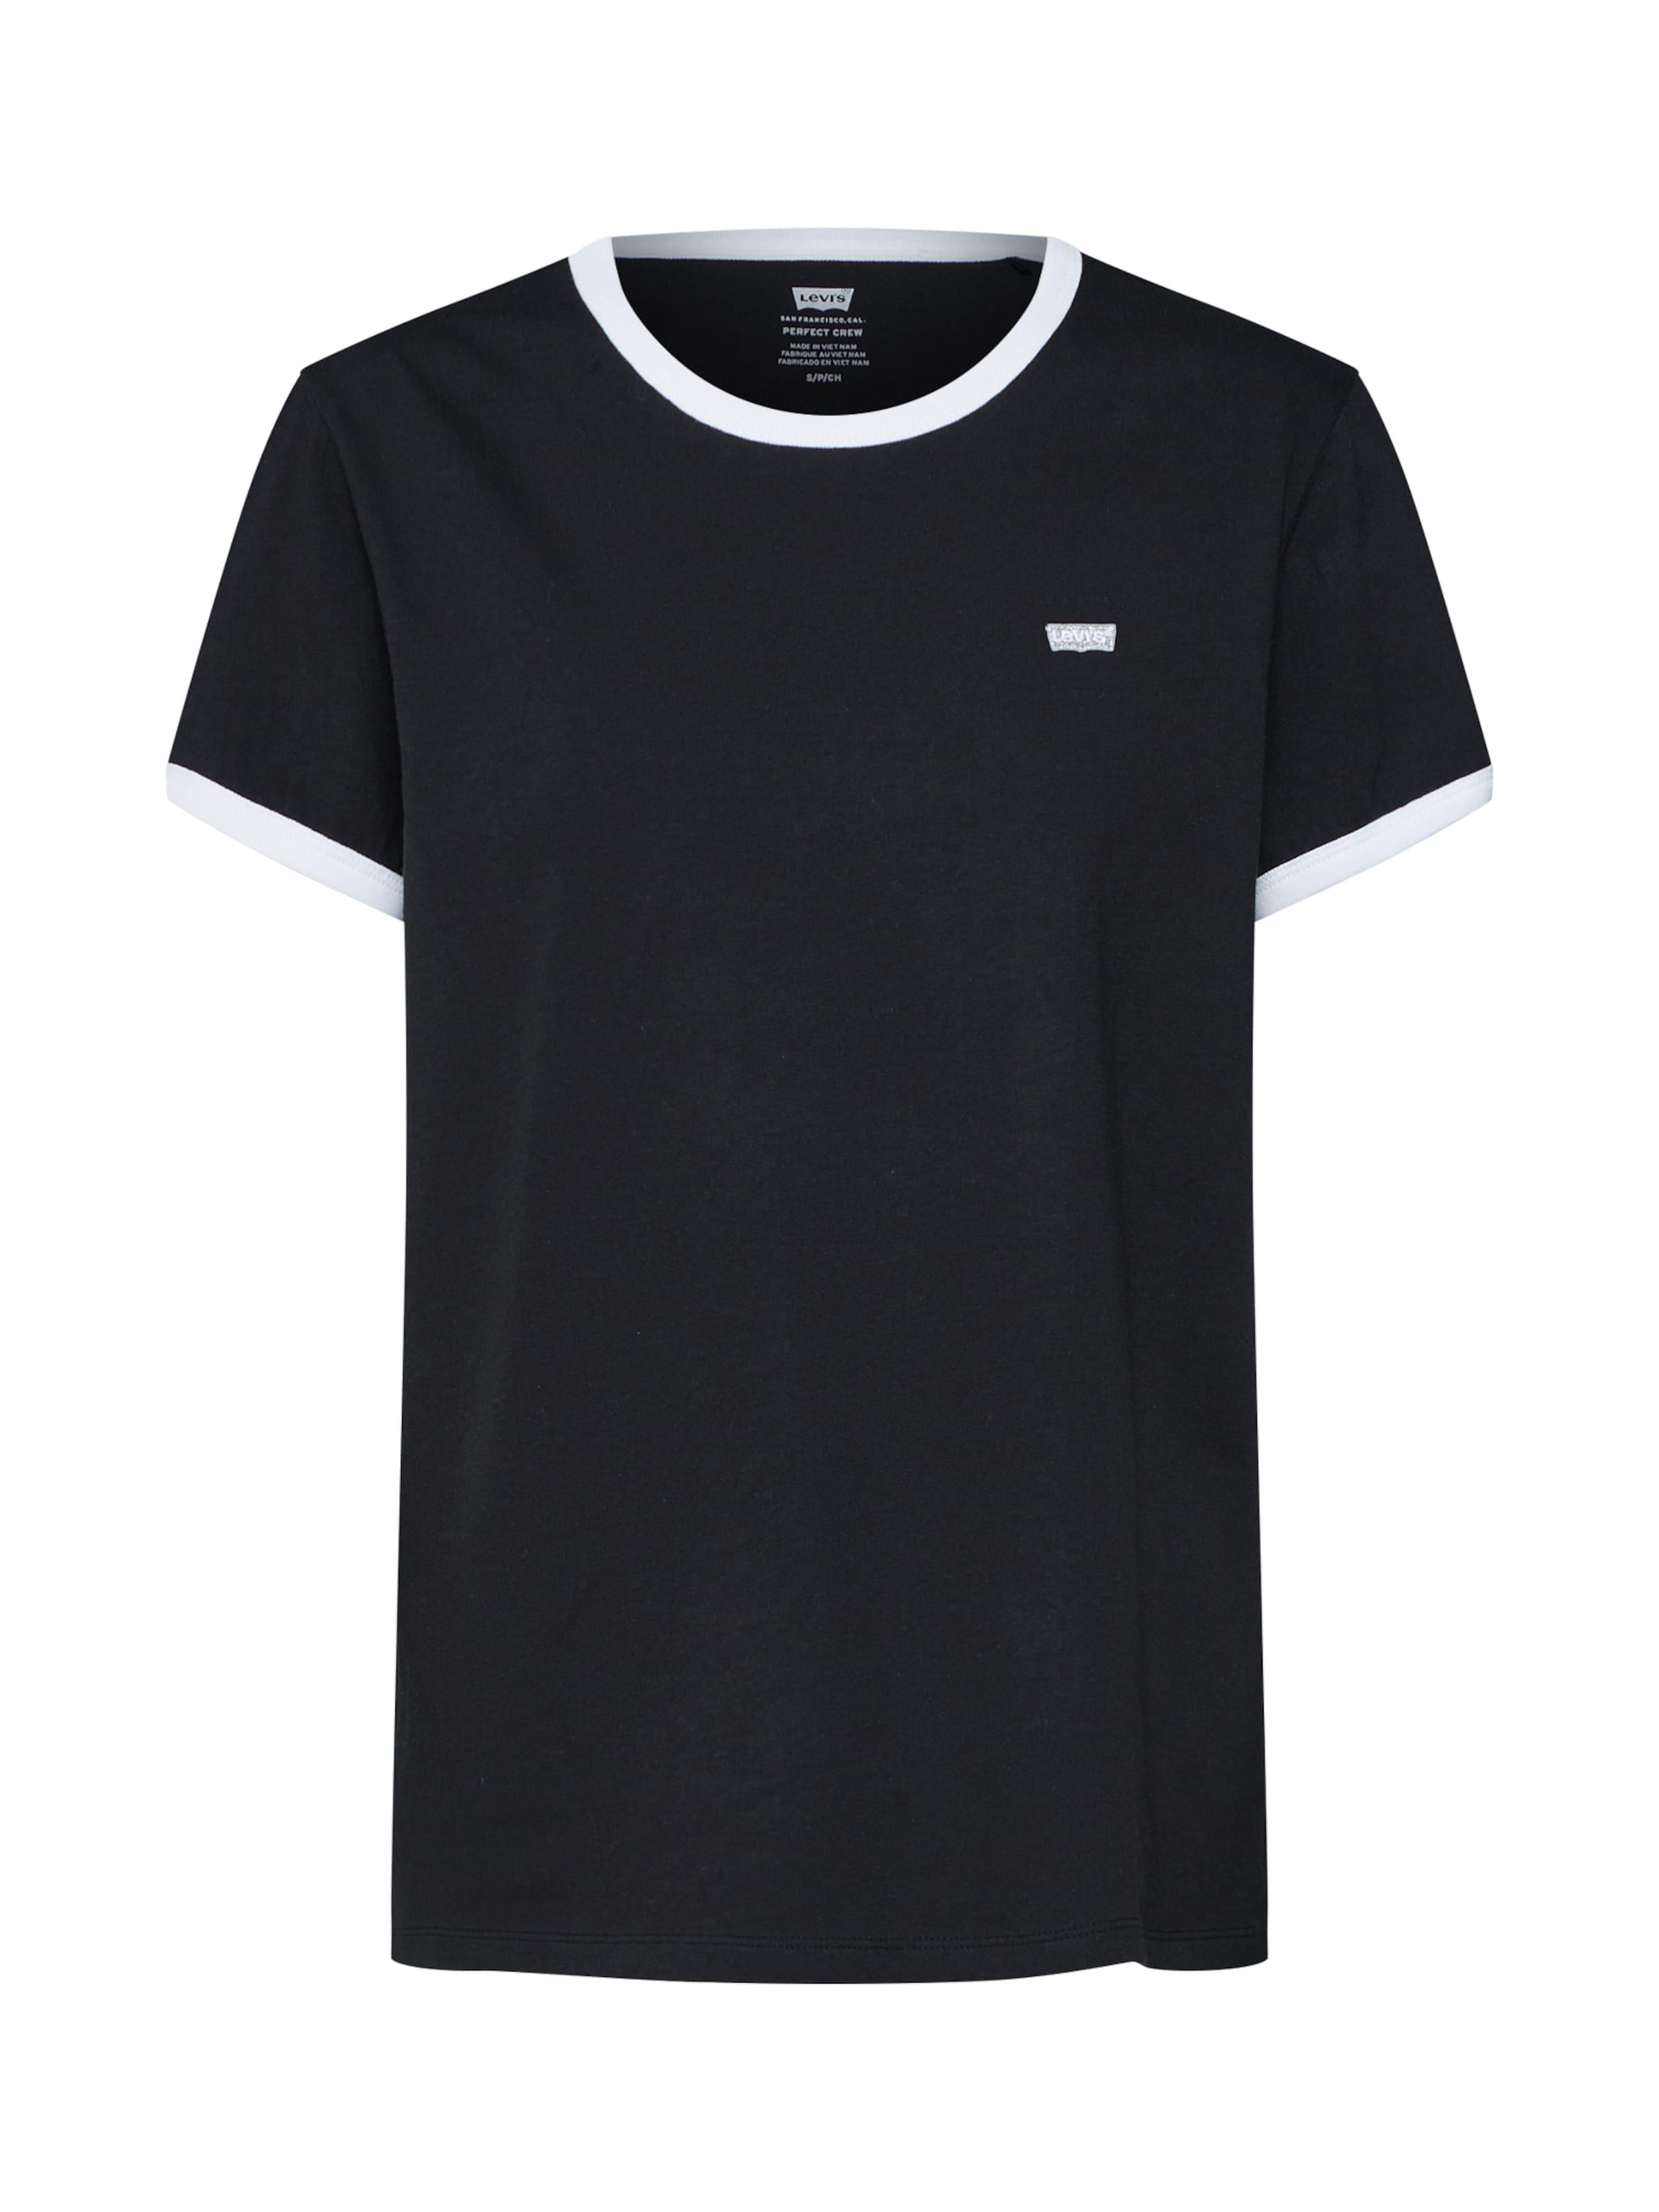 Ringer' 'perf Non gaphic Shirt Levi's In SchwarzWeiß WD29HEIY